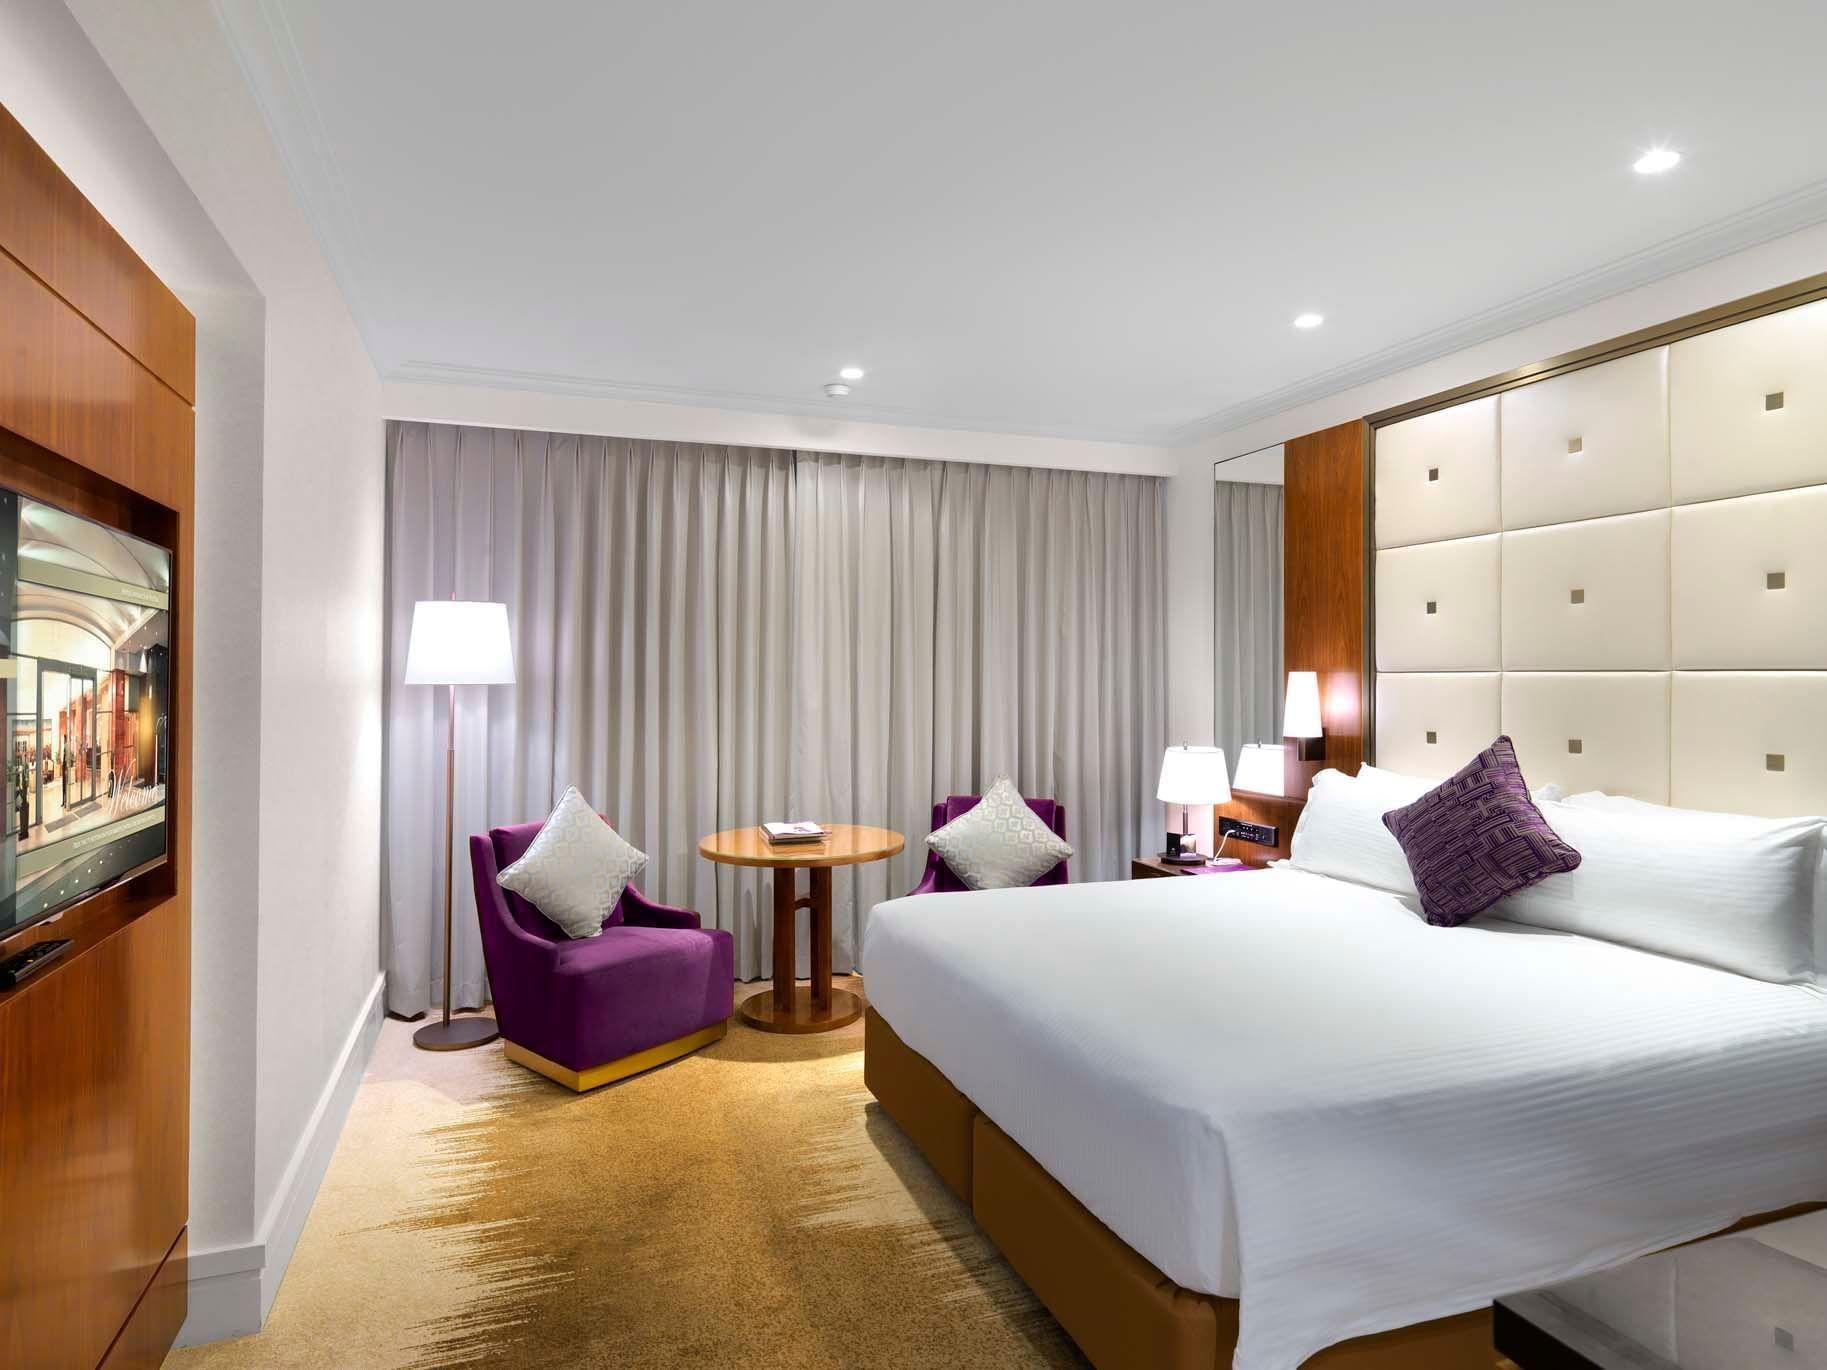 Deluxe Tower King Room at Amora Hotel at Amora Hotel